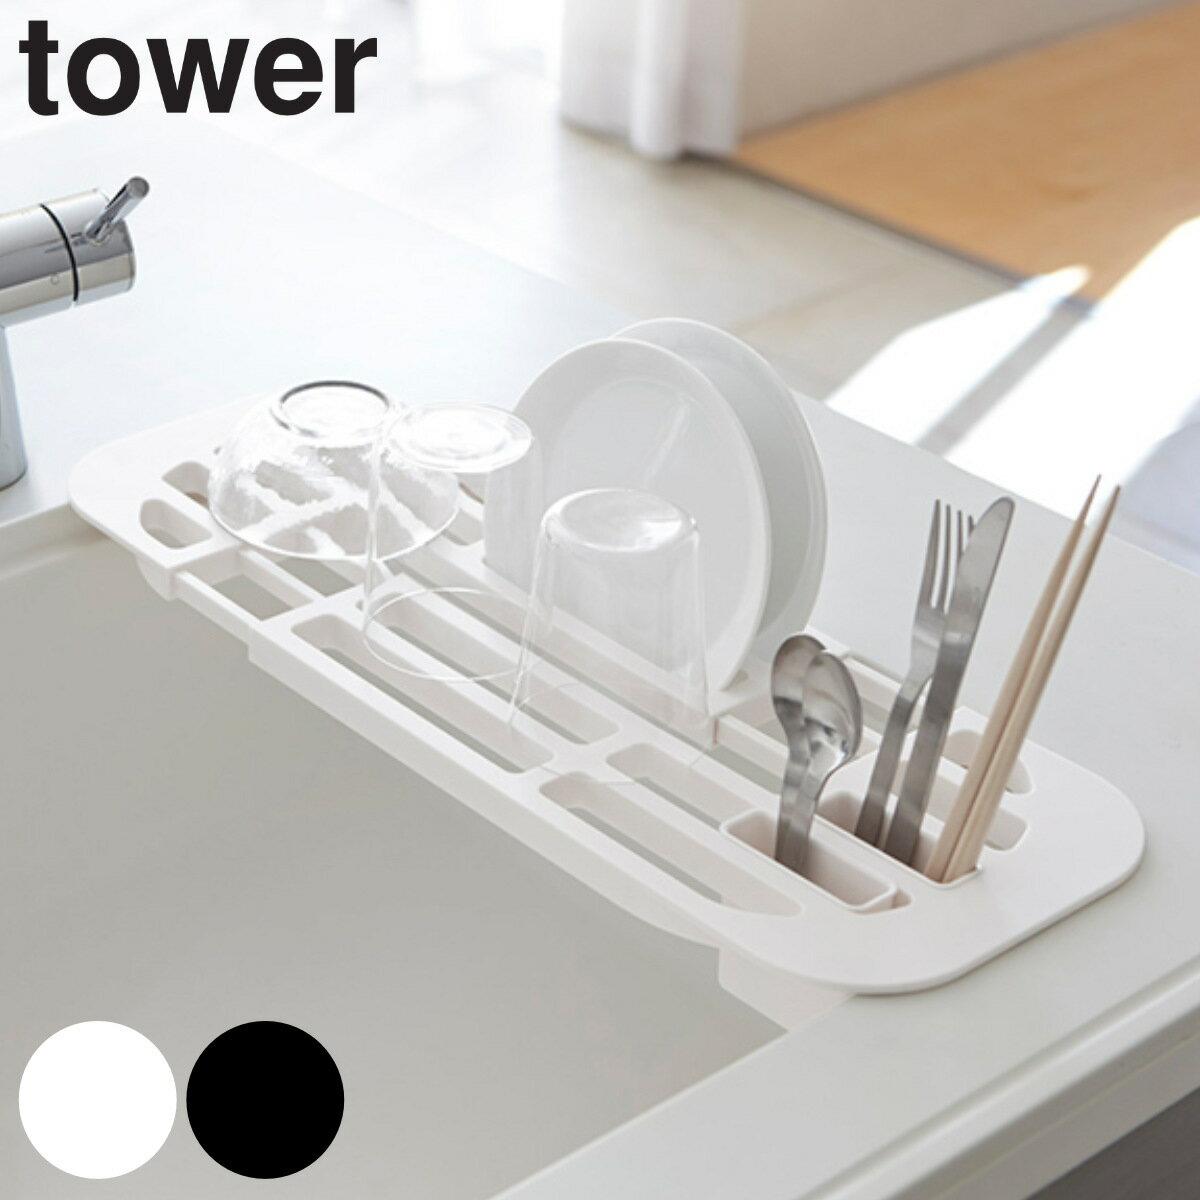 Draining Dish Drainer Rack Telescopic Dish Drainer Rack Tower Tower  (applications Drain Tray Drain Mat Dish Racks Sink On Cooking Telescopic  Folding Think ...